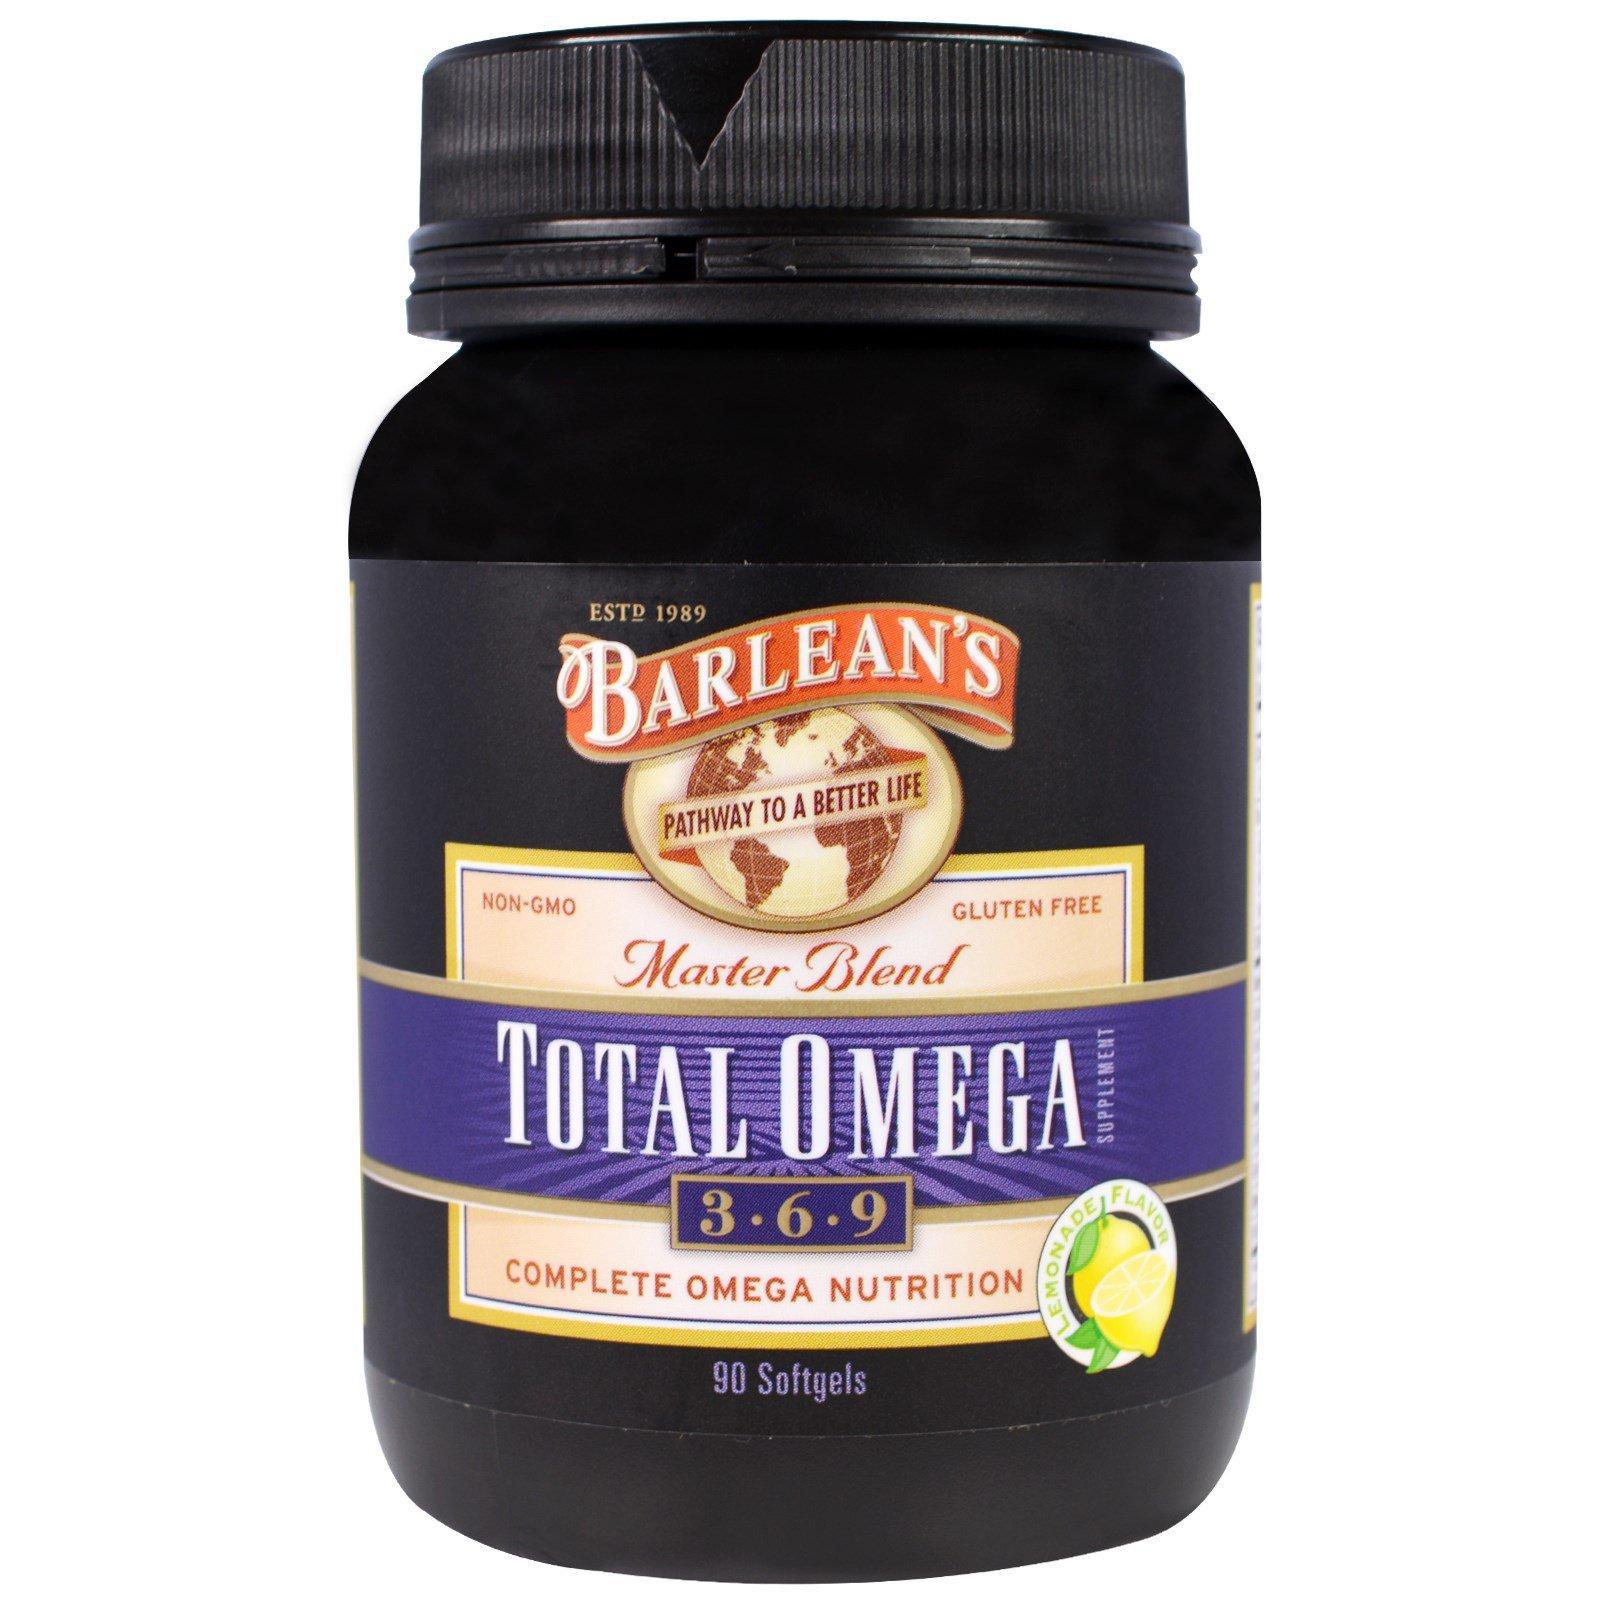 Barlean's, Тотал Омега 3 · 6 · 9, Master Blend, со вкусом лимонада, 90 капсул